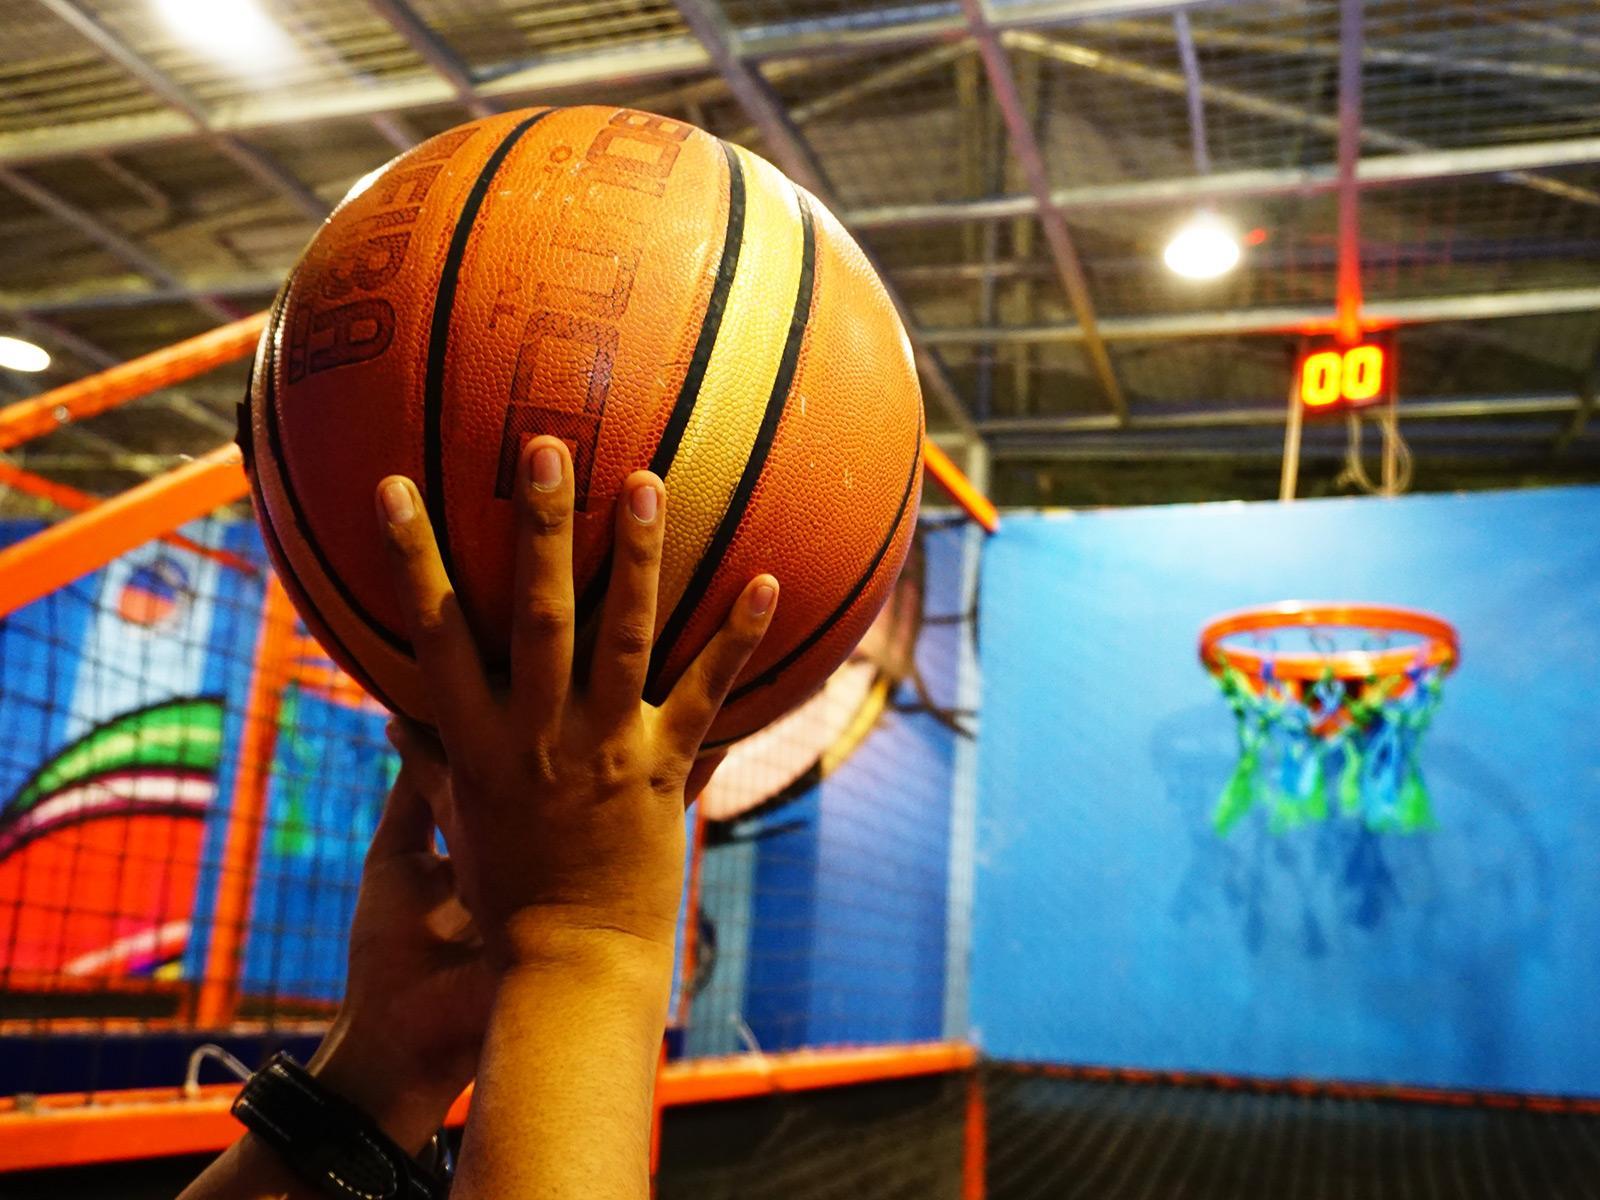 Wisata Gofun Bojonegoro Wajib Dikunjungi Basket Komple Taman Hiburan Kab